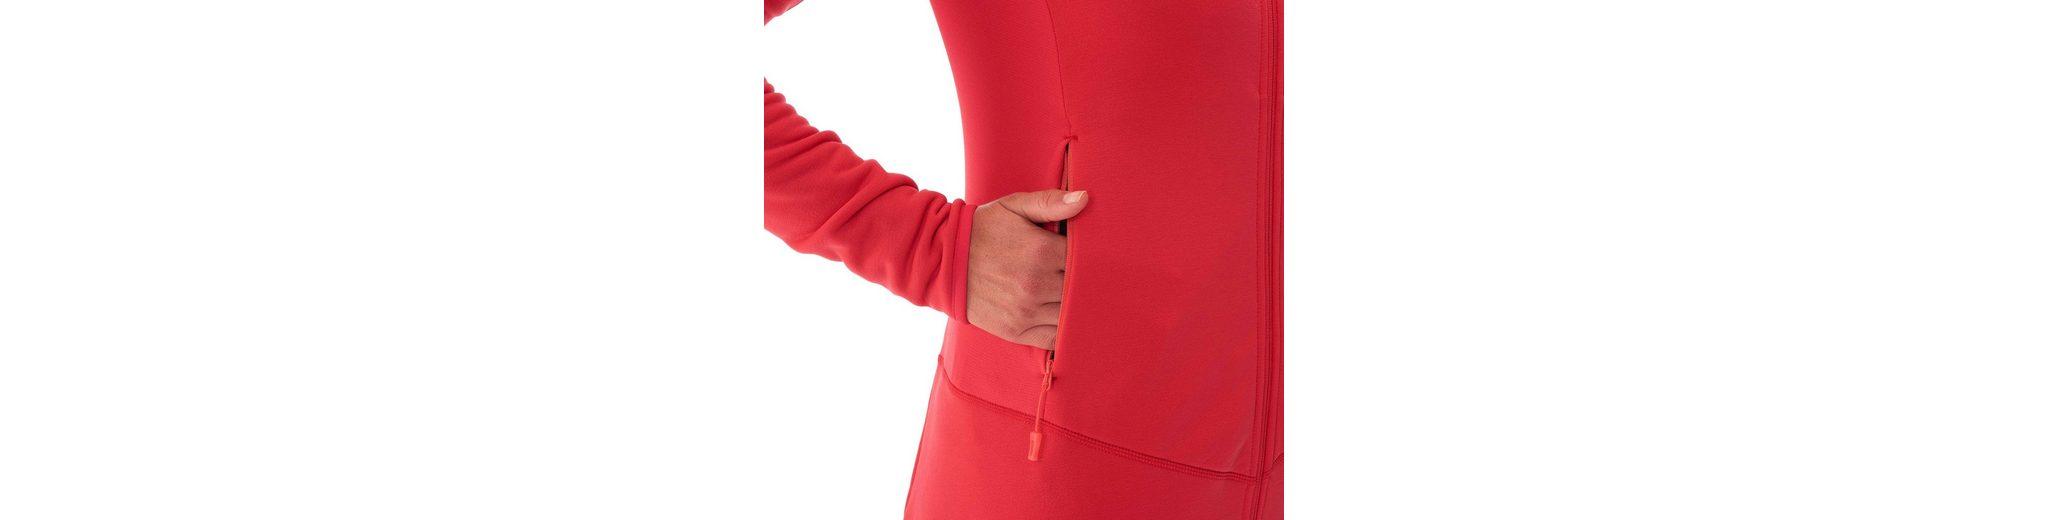 Outdoorjacke Power Women Jacket Millet Outdoorjacke Charmoz Millet LD qxEXS4